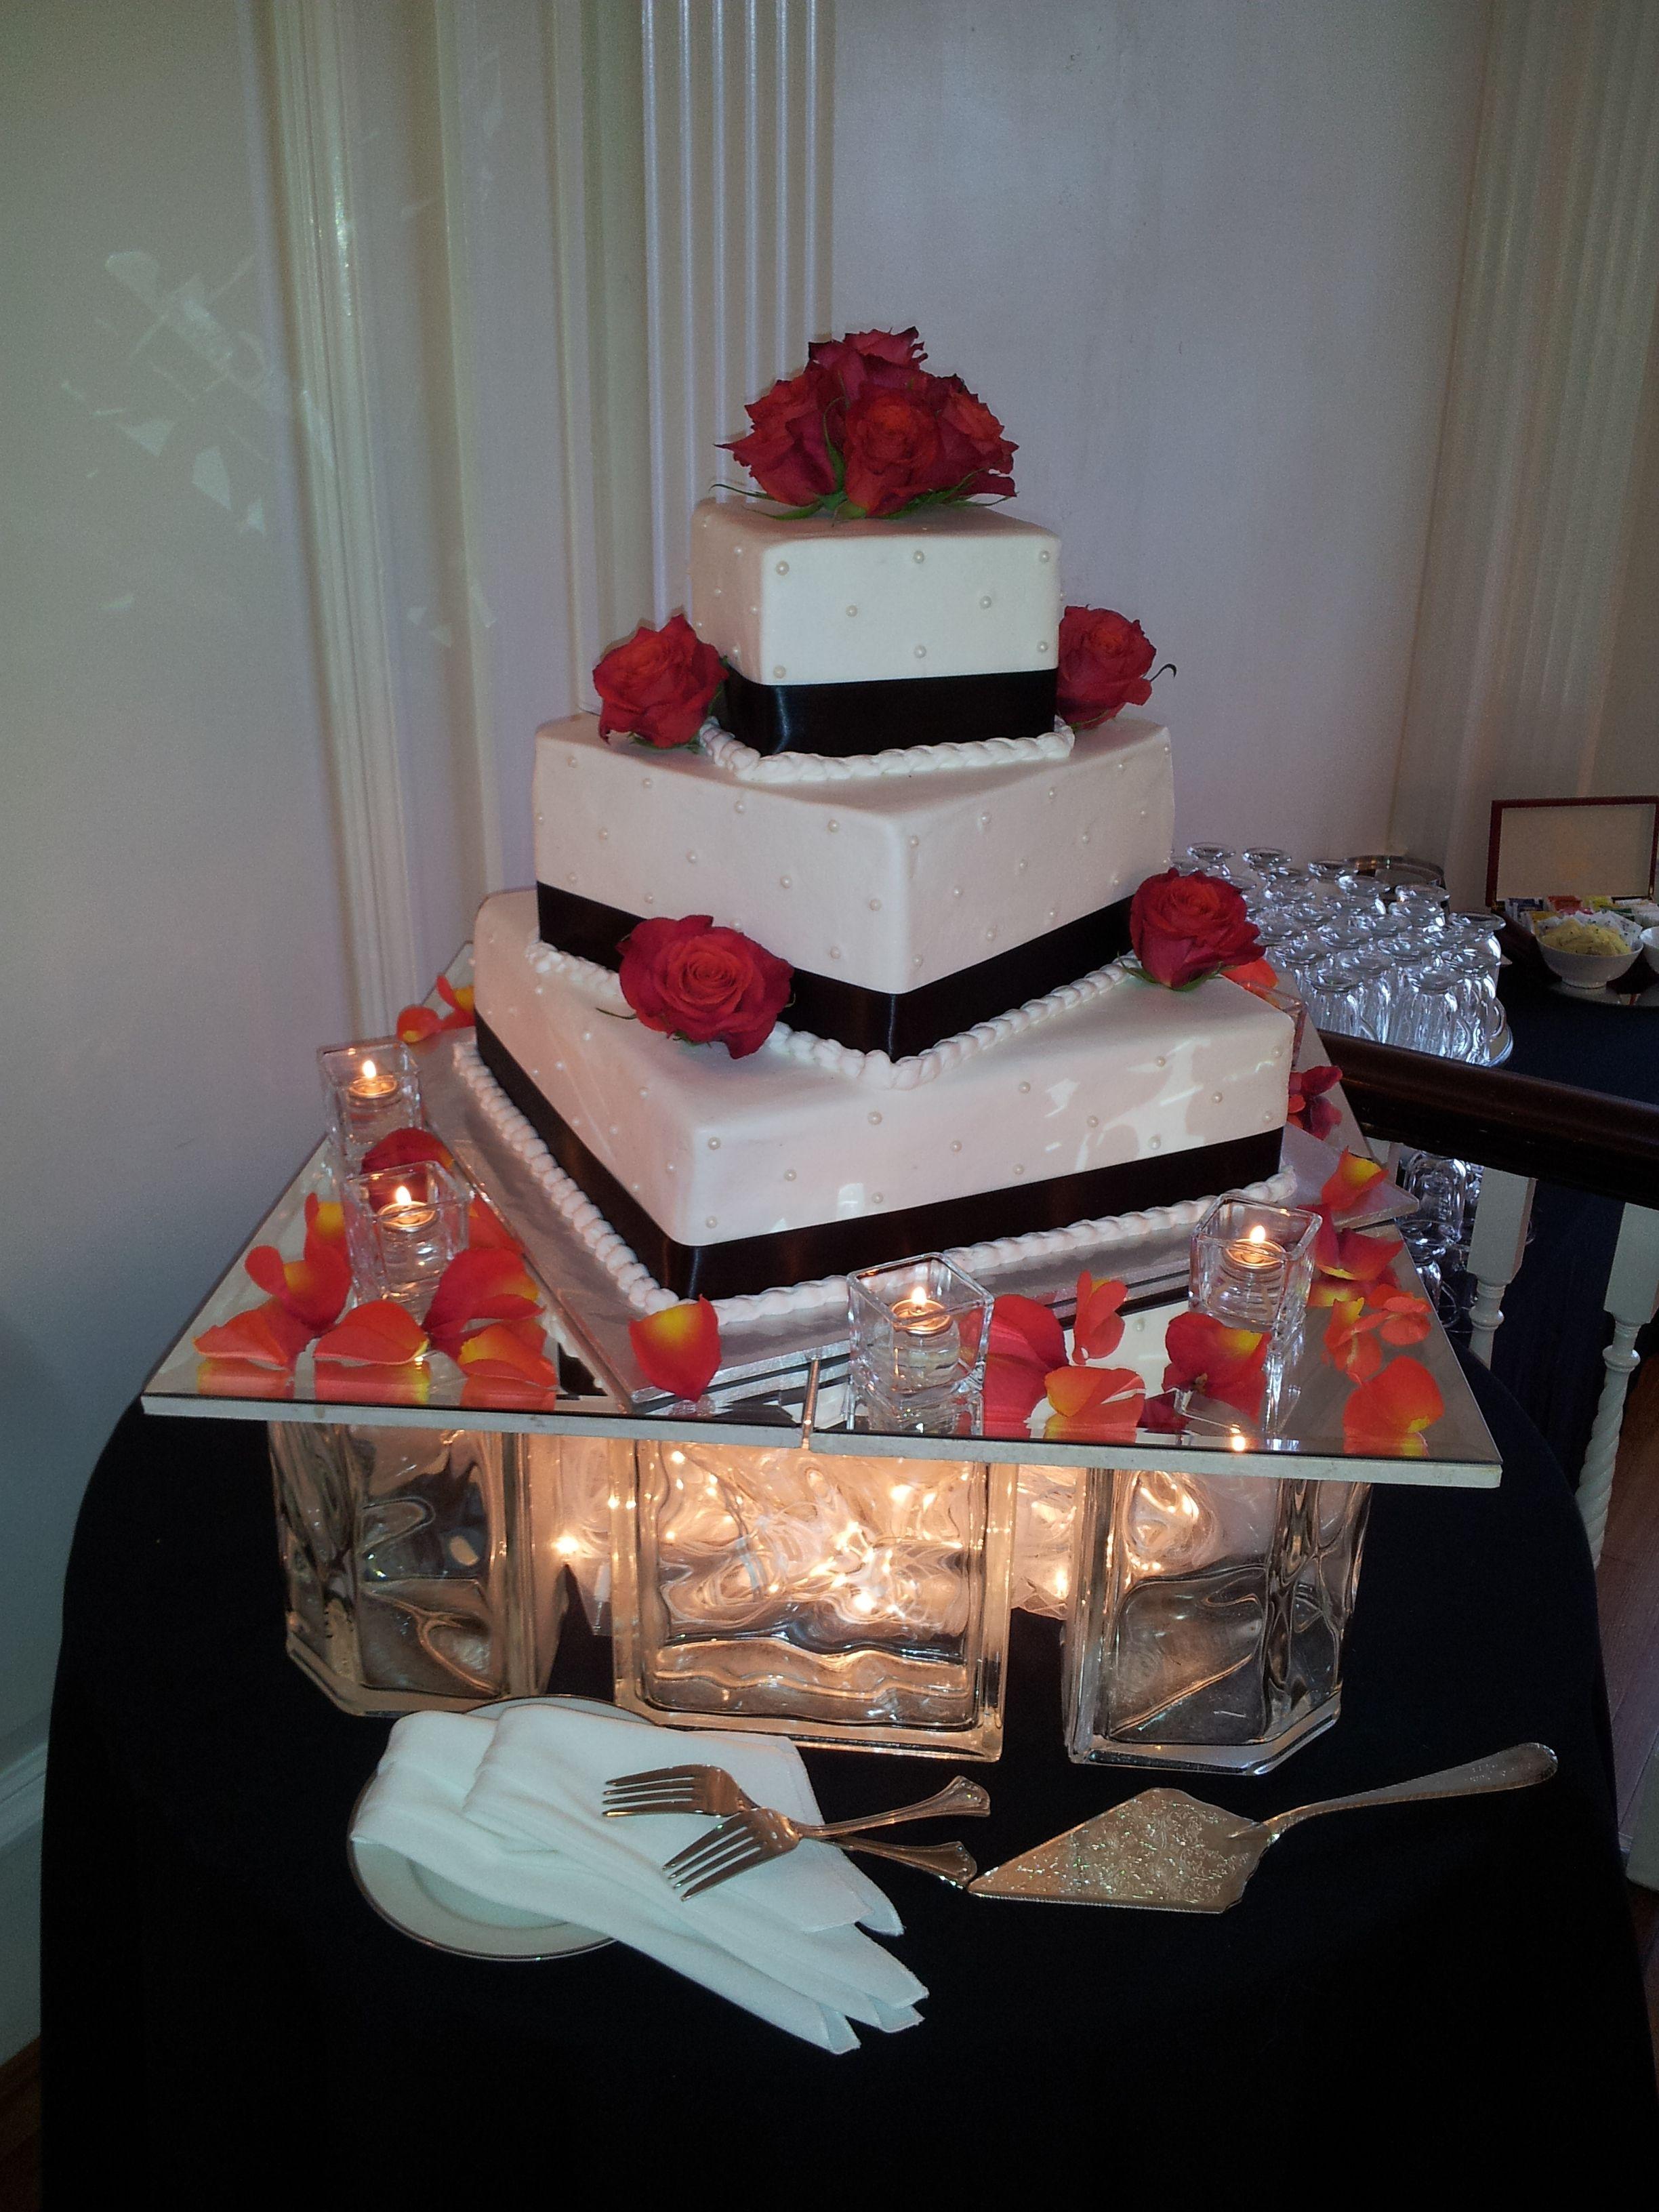 Glass block cake display | Wedding Decorating Ideas | Pinterest ...